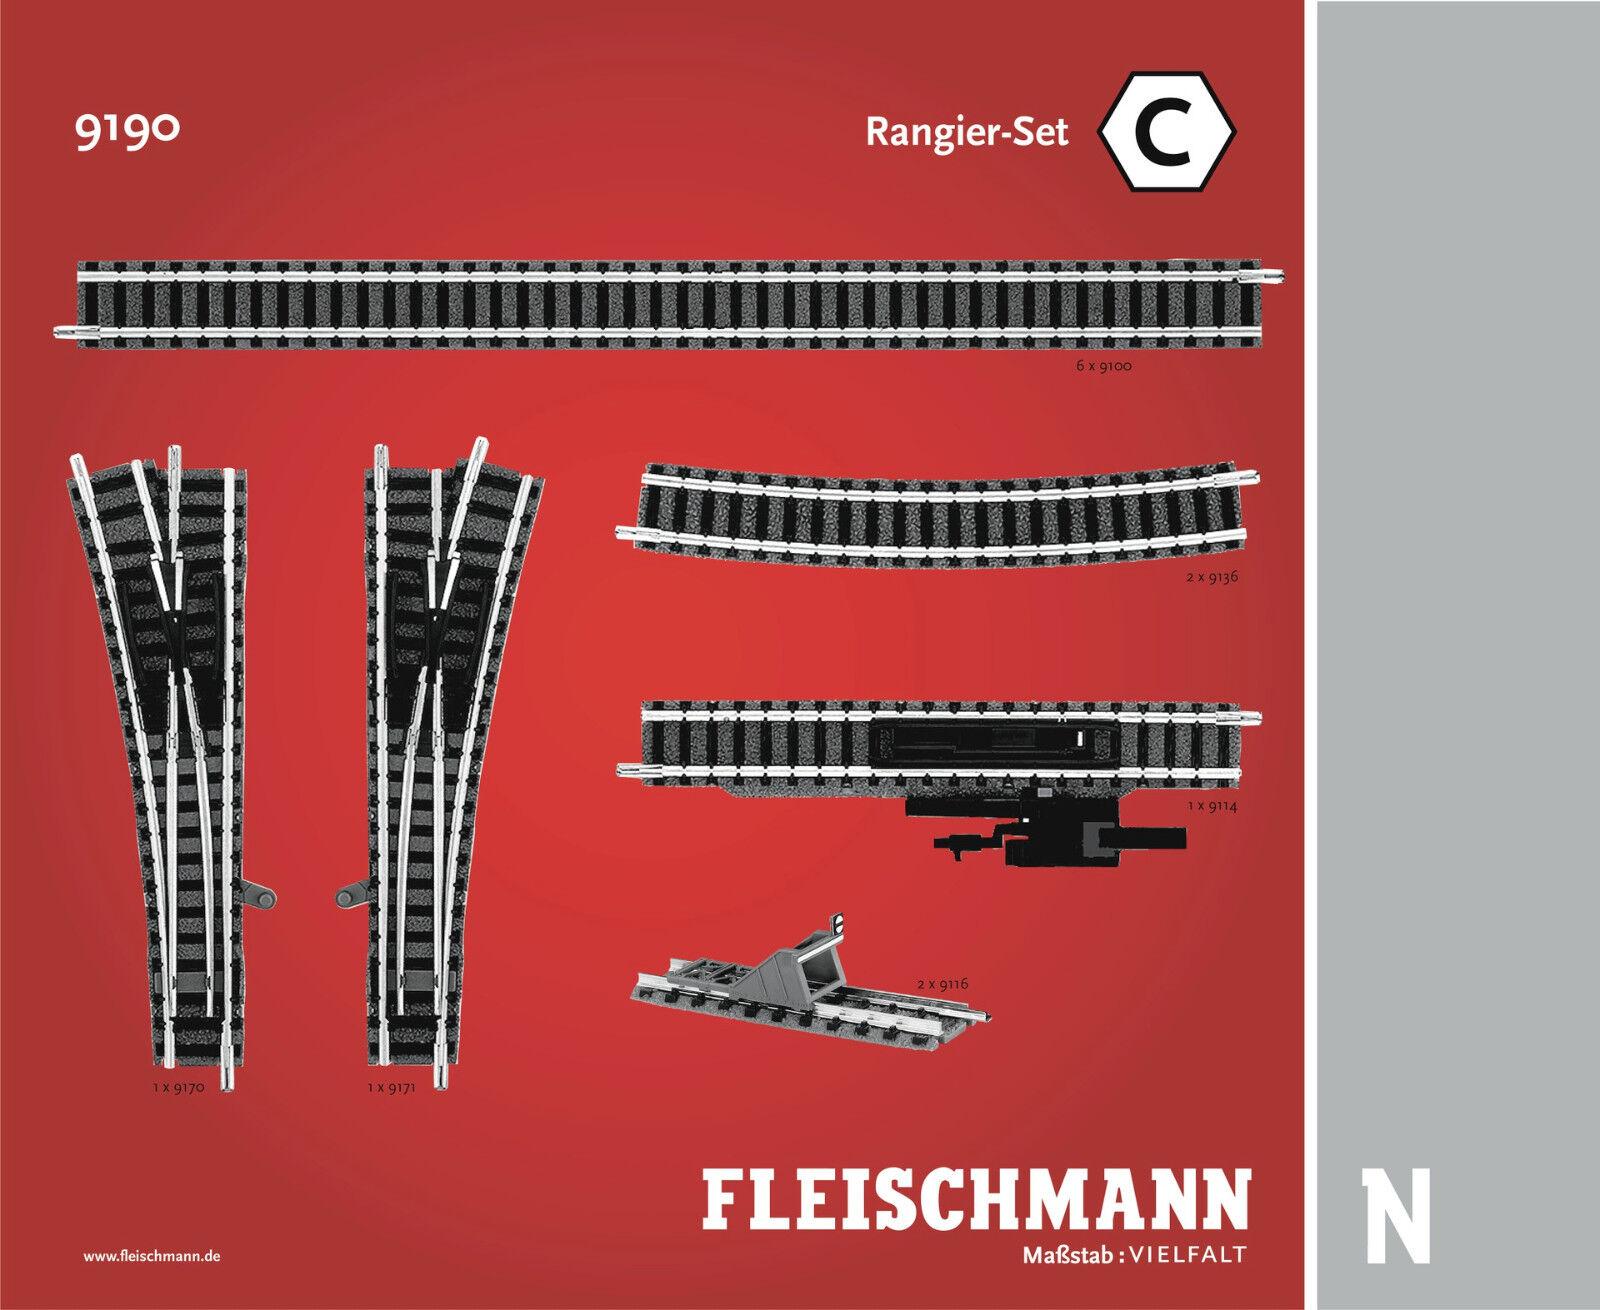 Fleischmann n 9190 maniobra-set C-nuevo + embalaje original